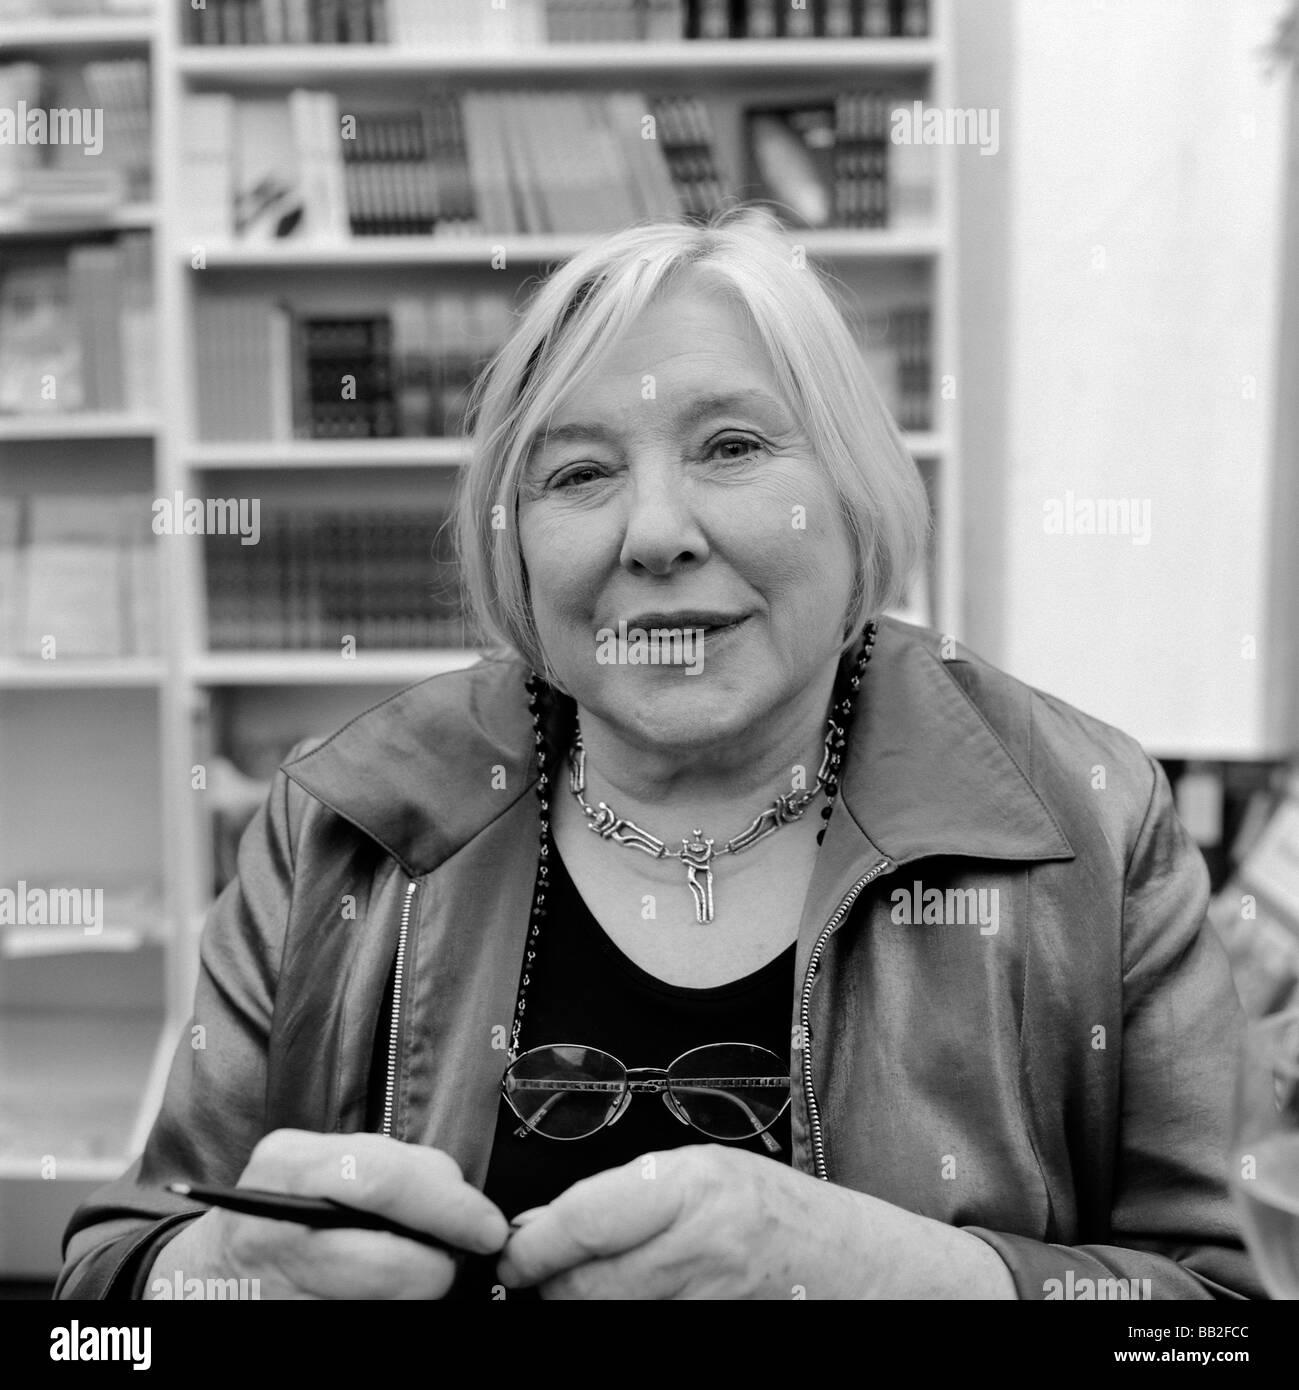 British author Fay Weldon at the Hay Festival Hay-on-Wye Wales UK Stock Photo